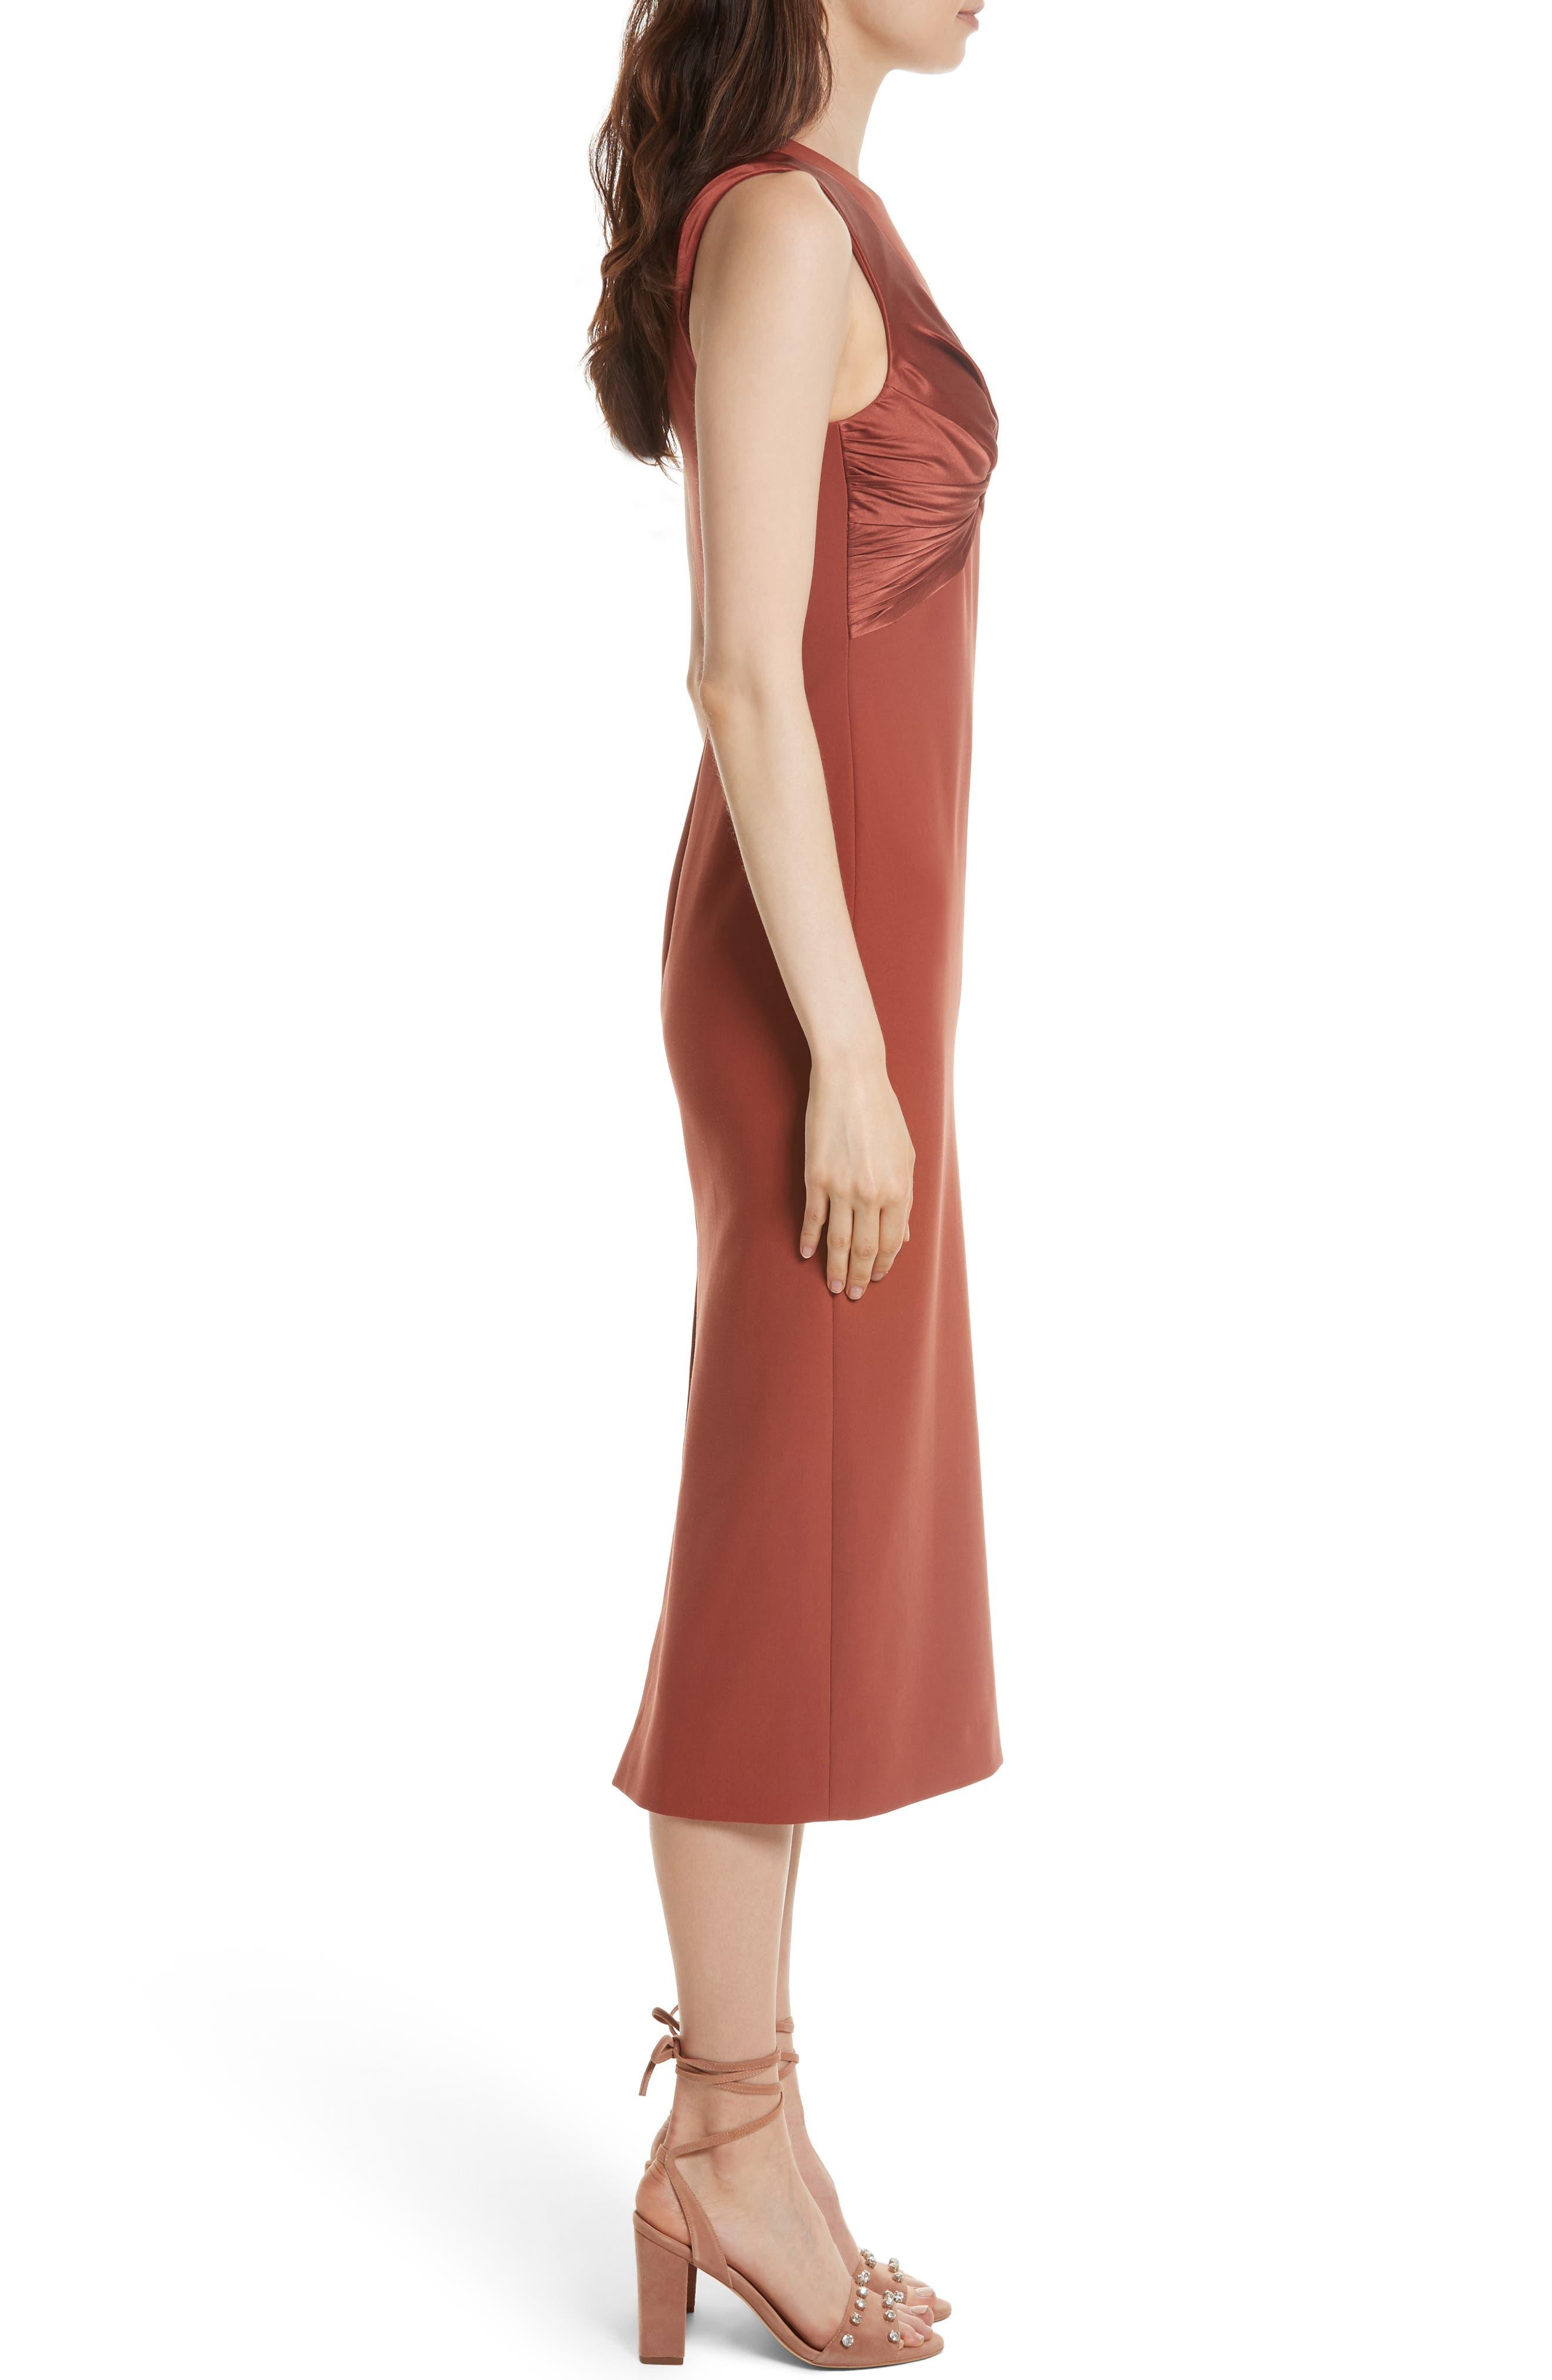 Adelise Crossover Sleeveless Sheath Dress,                             Alternate thumbnail 2, color,                             845